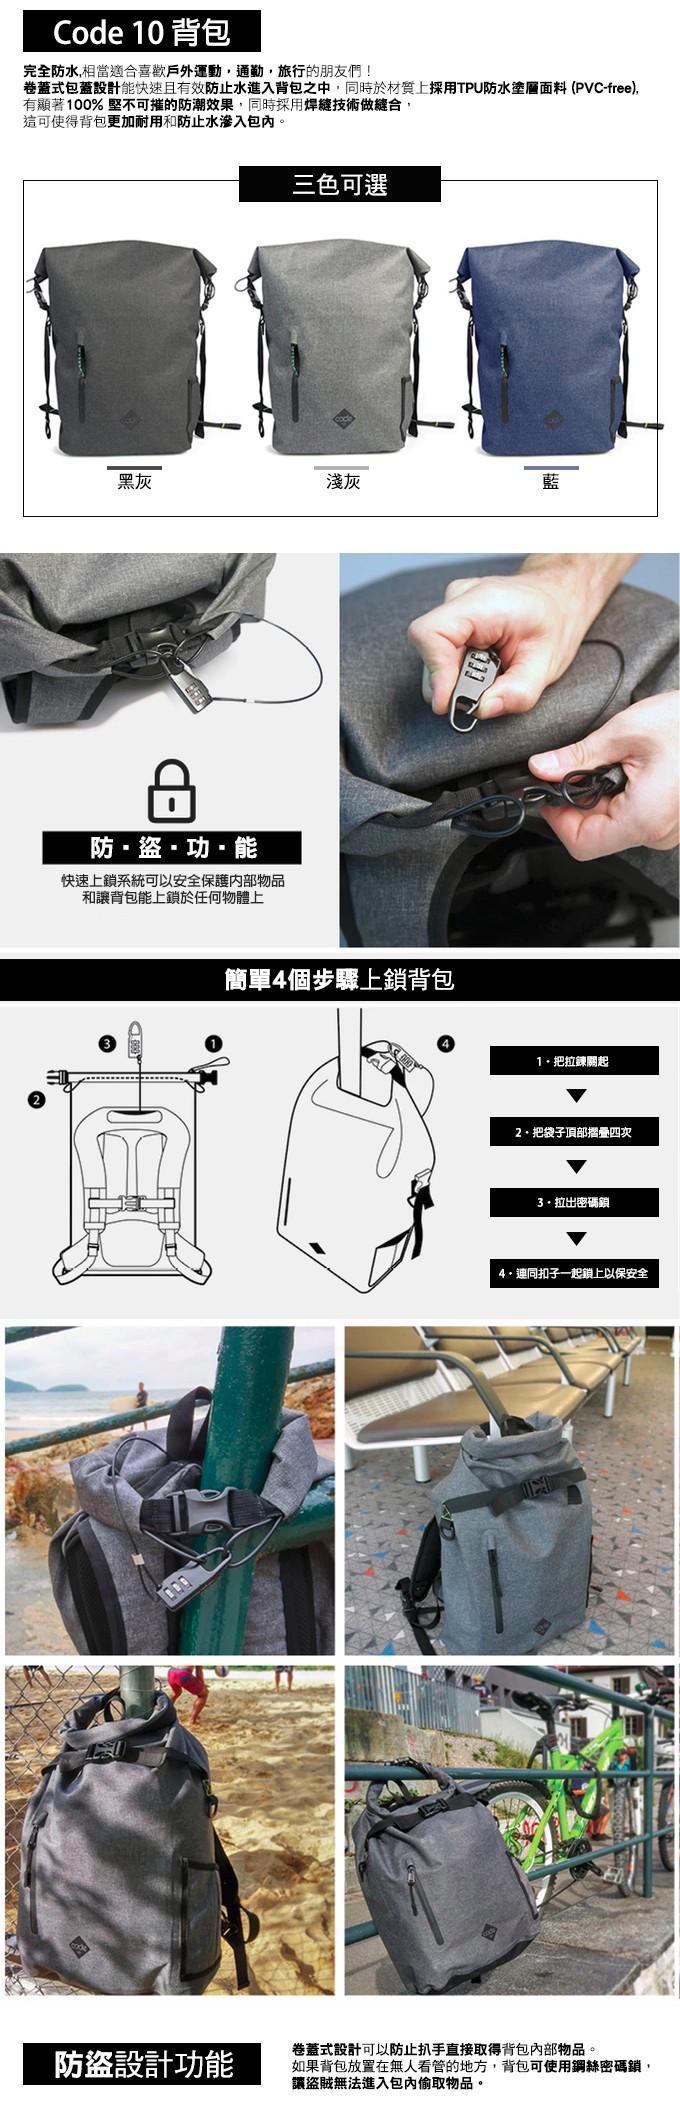 Code-10-Waterproof-Theft-Proof-Tech-Ready-backpacks-02